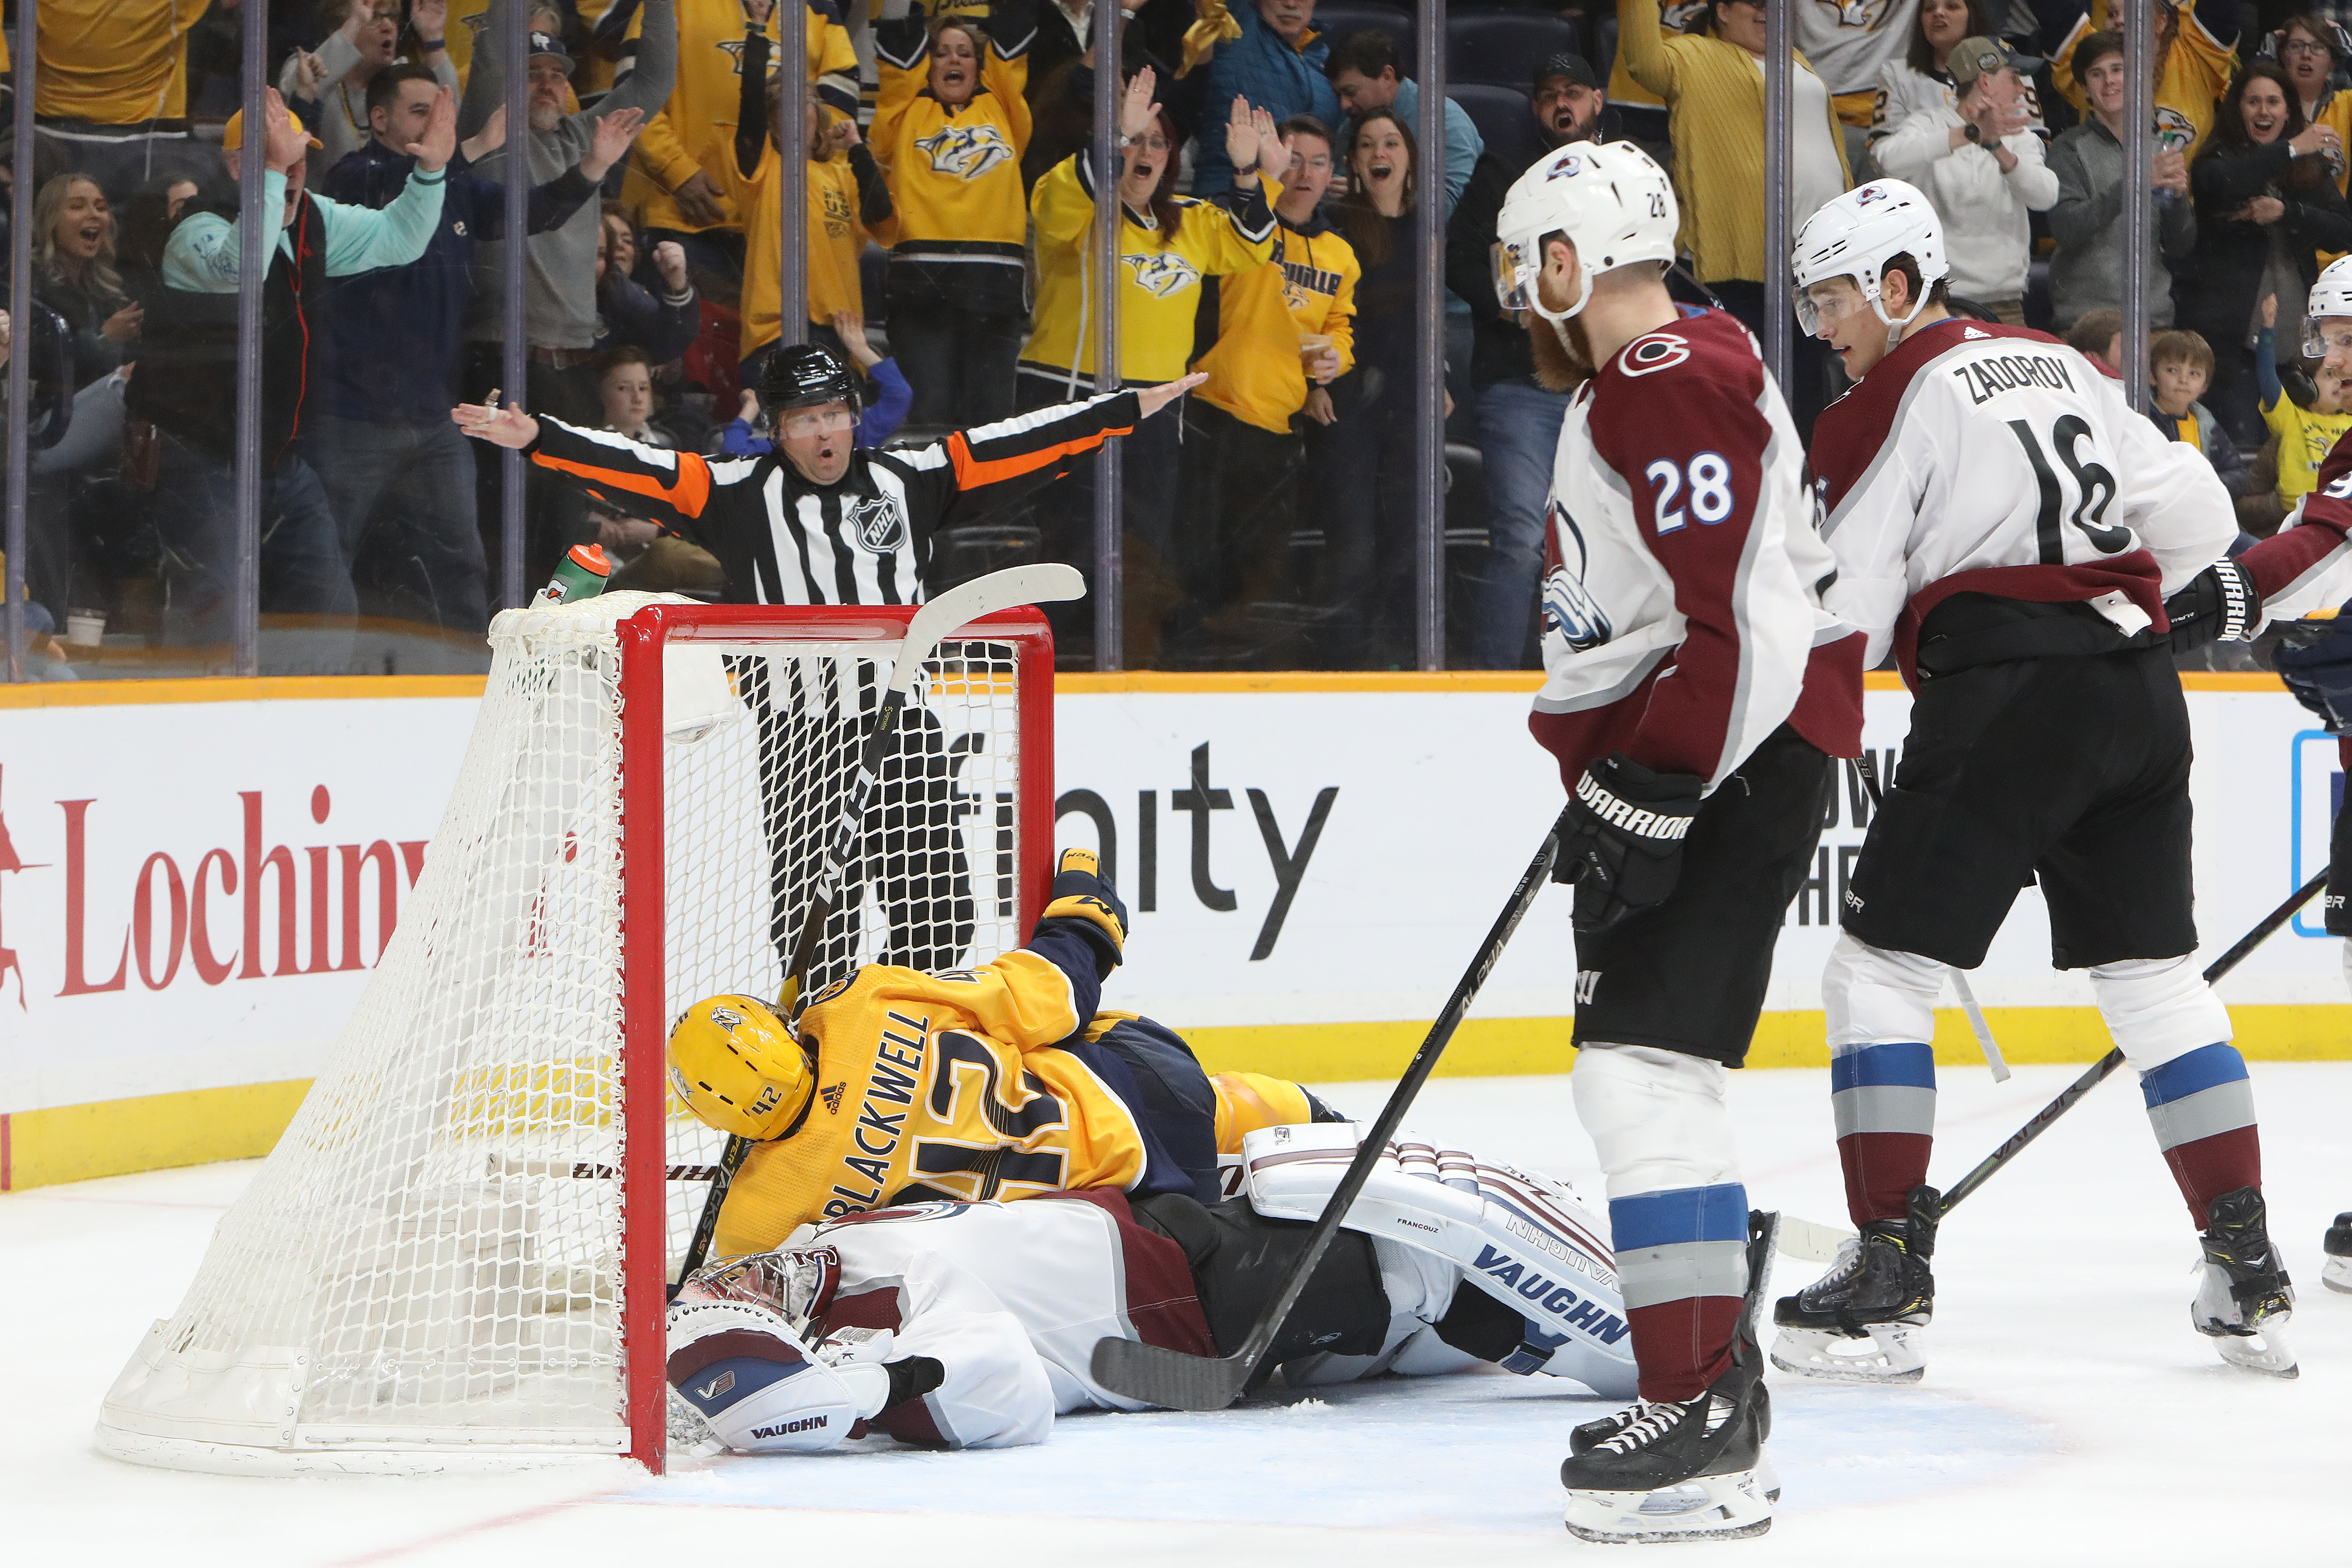 NHL: FEB 29 Avalanche at Predators